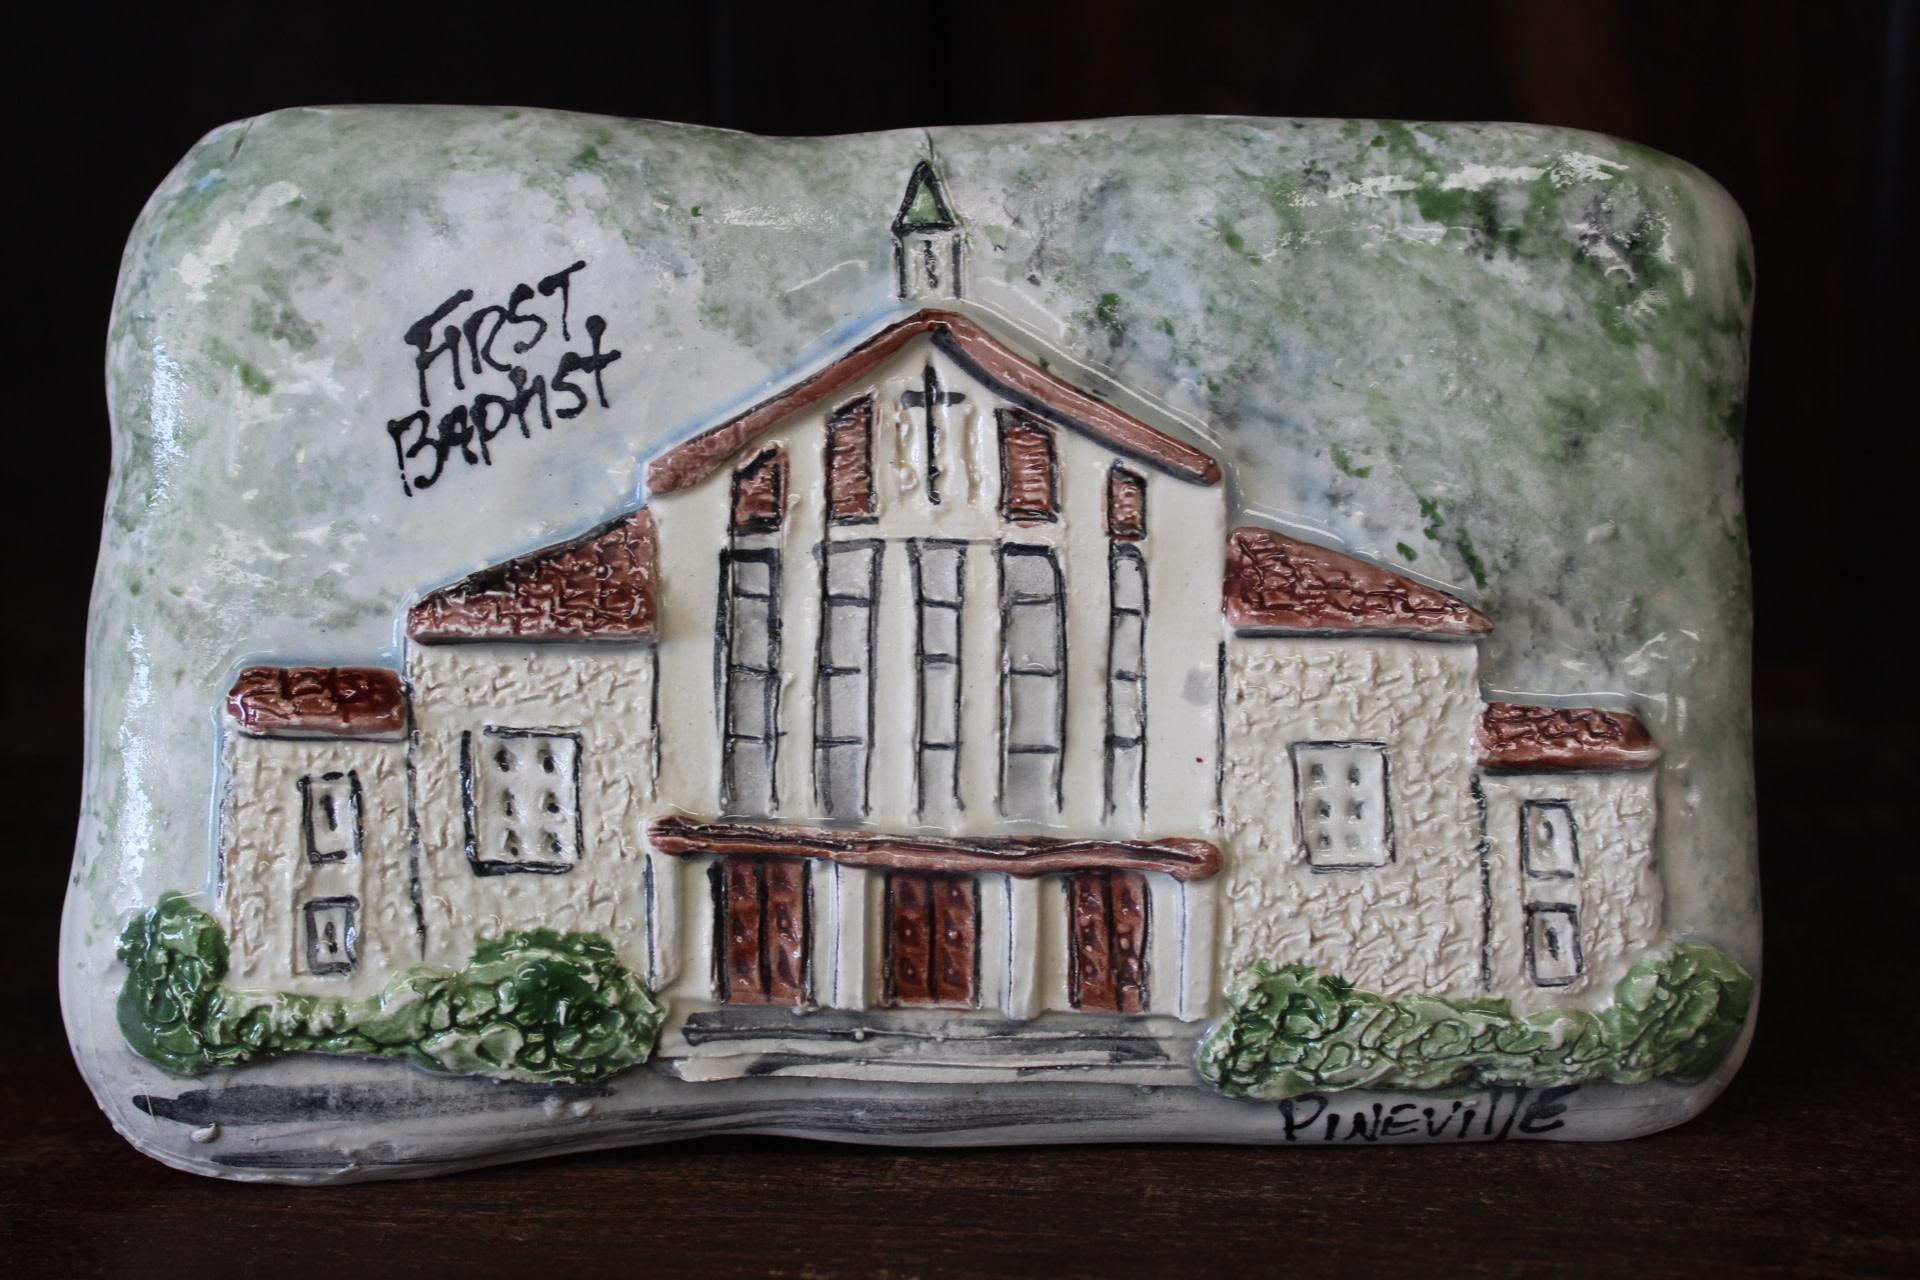 Architectural Memories First Baptist Church Plaque